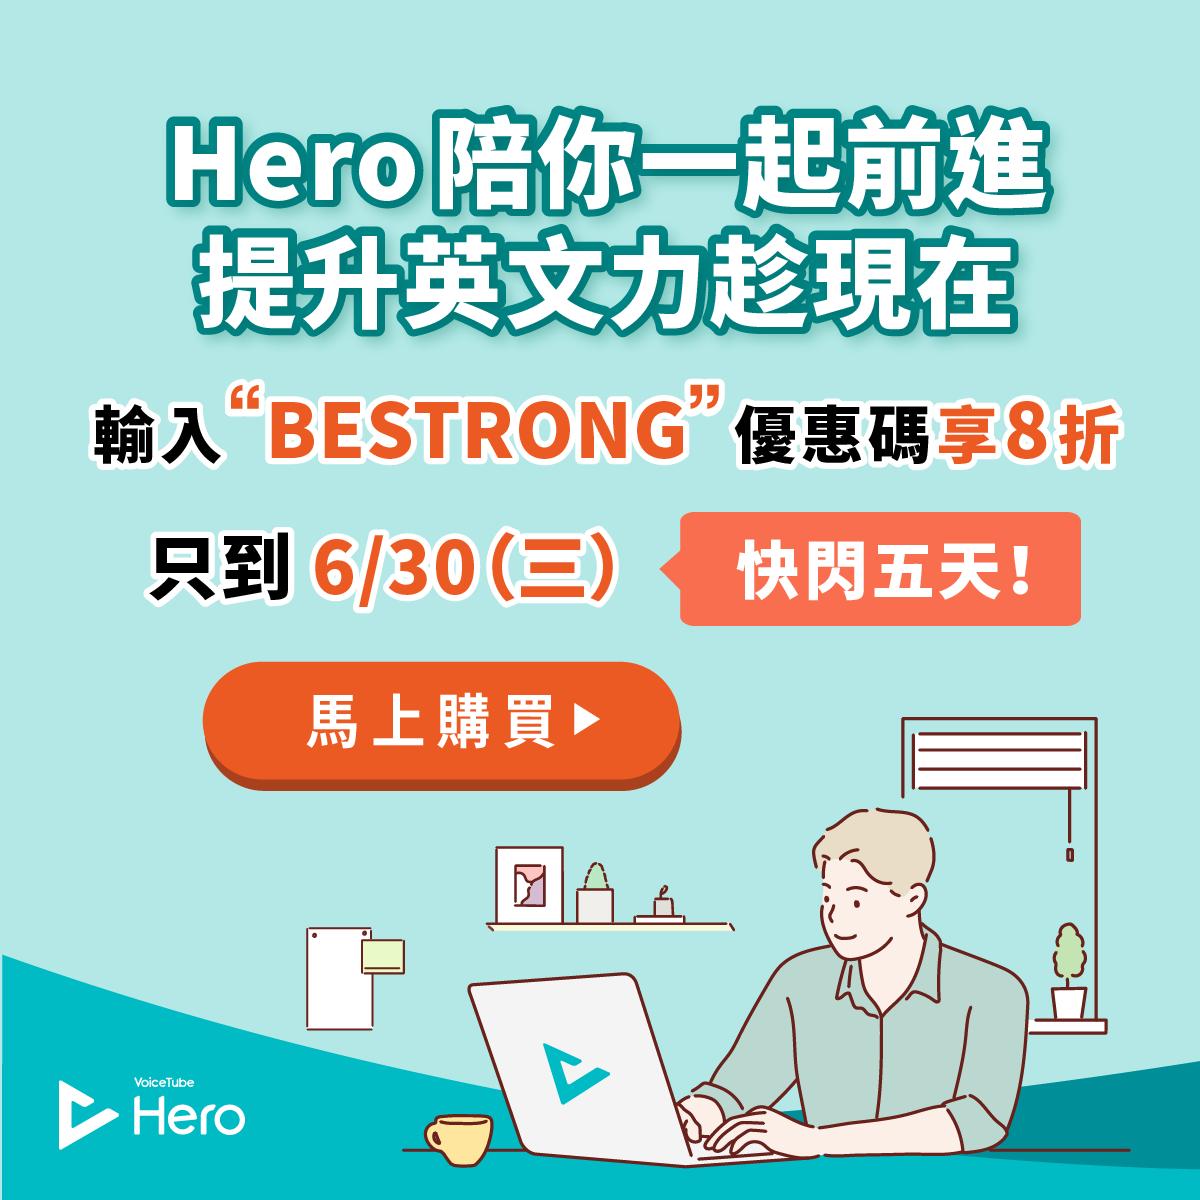 VoiceTube Hero 線上課程